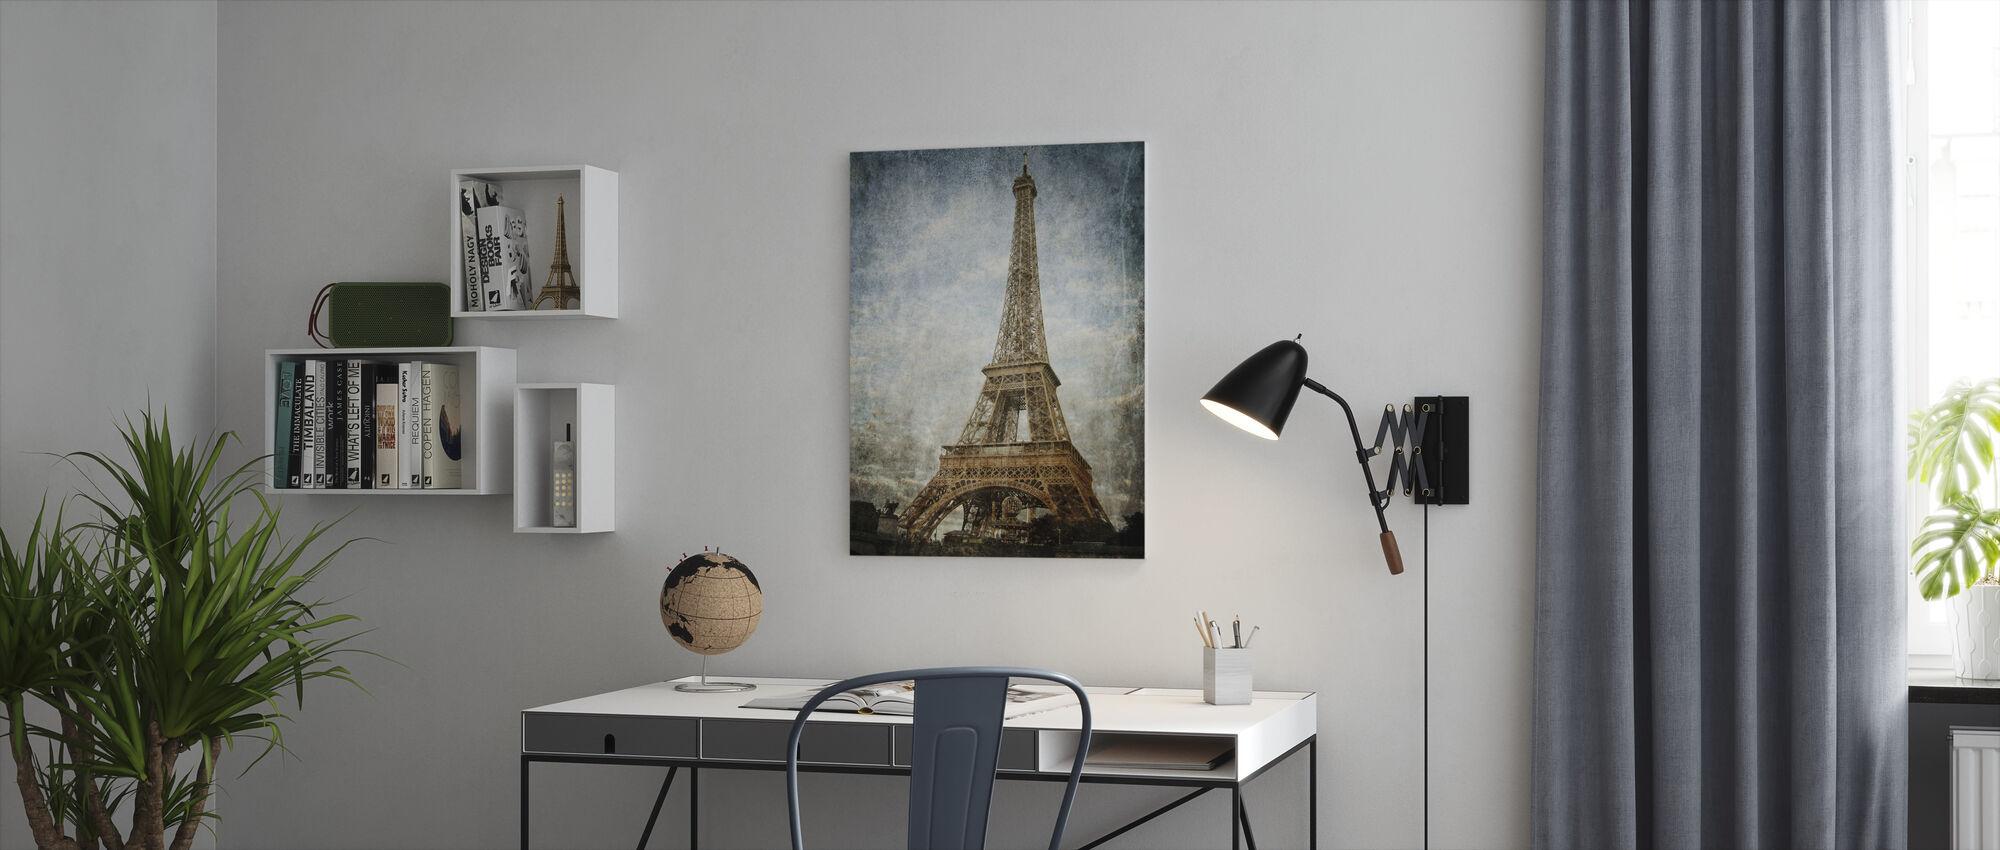 Vintage Eiffel Tower - Canvas print - Office